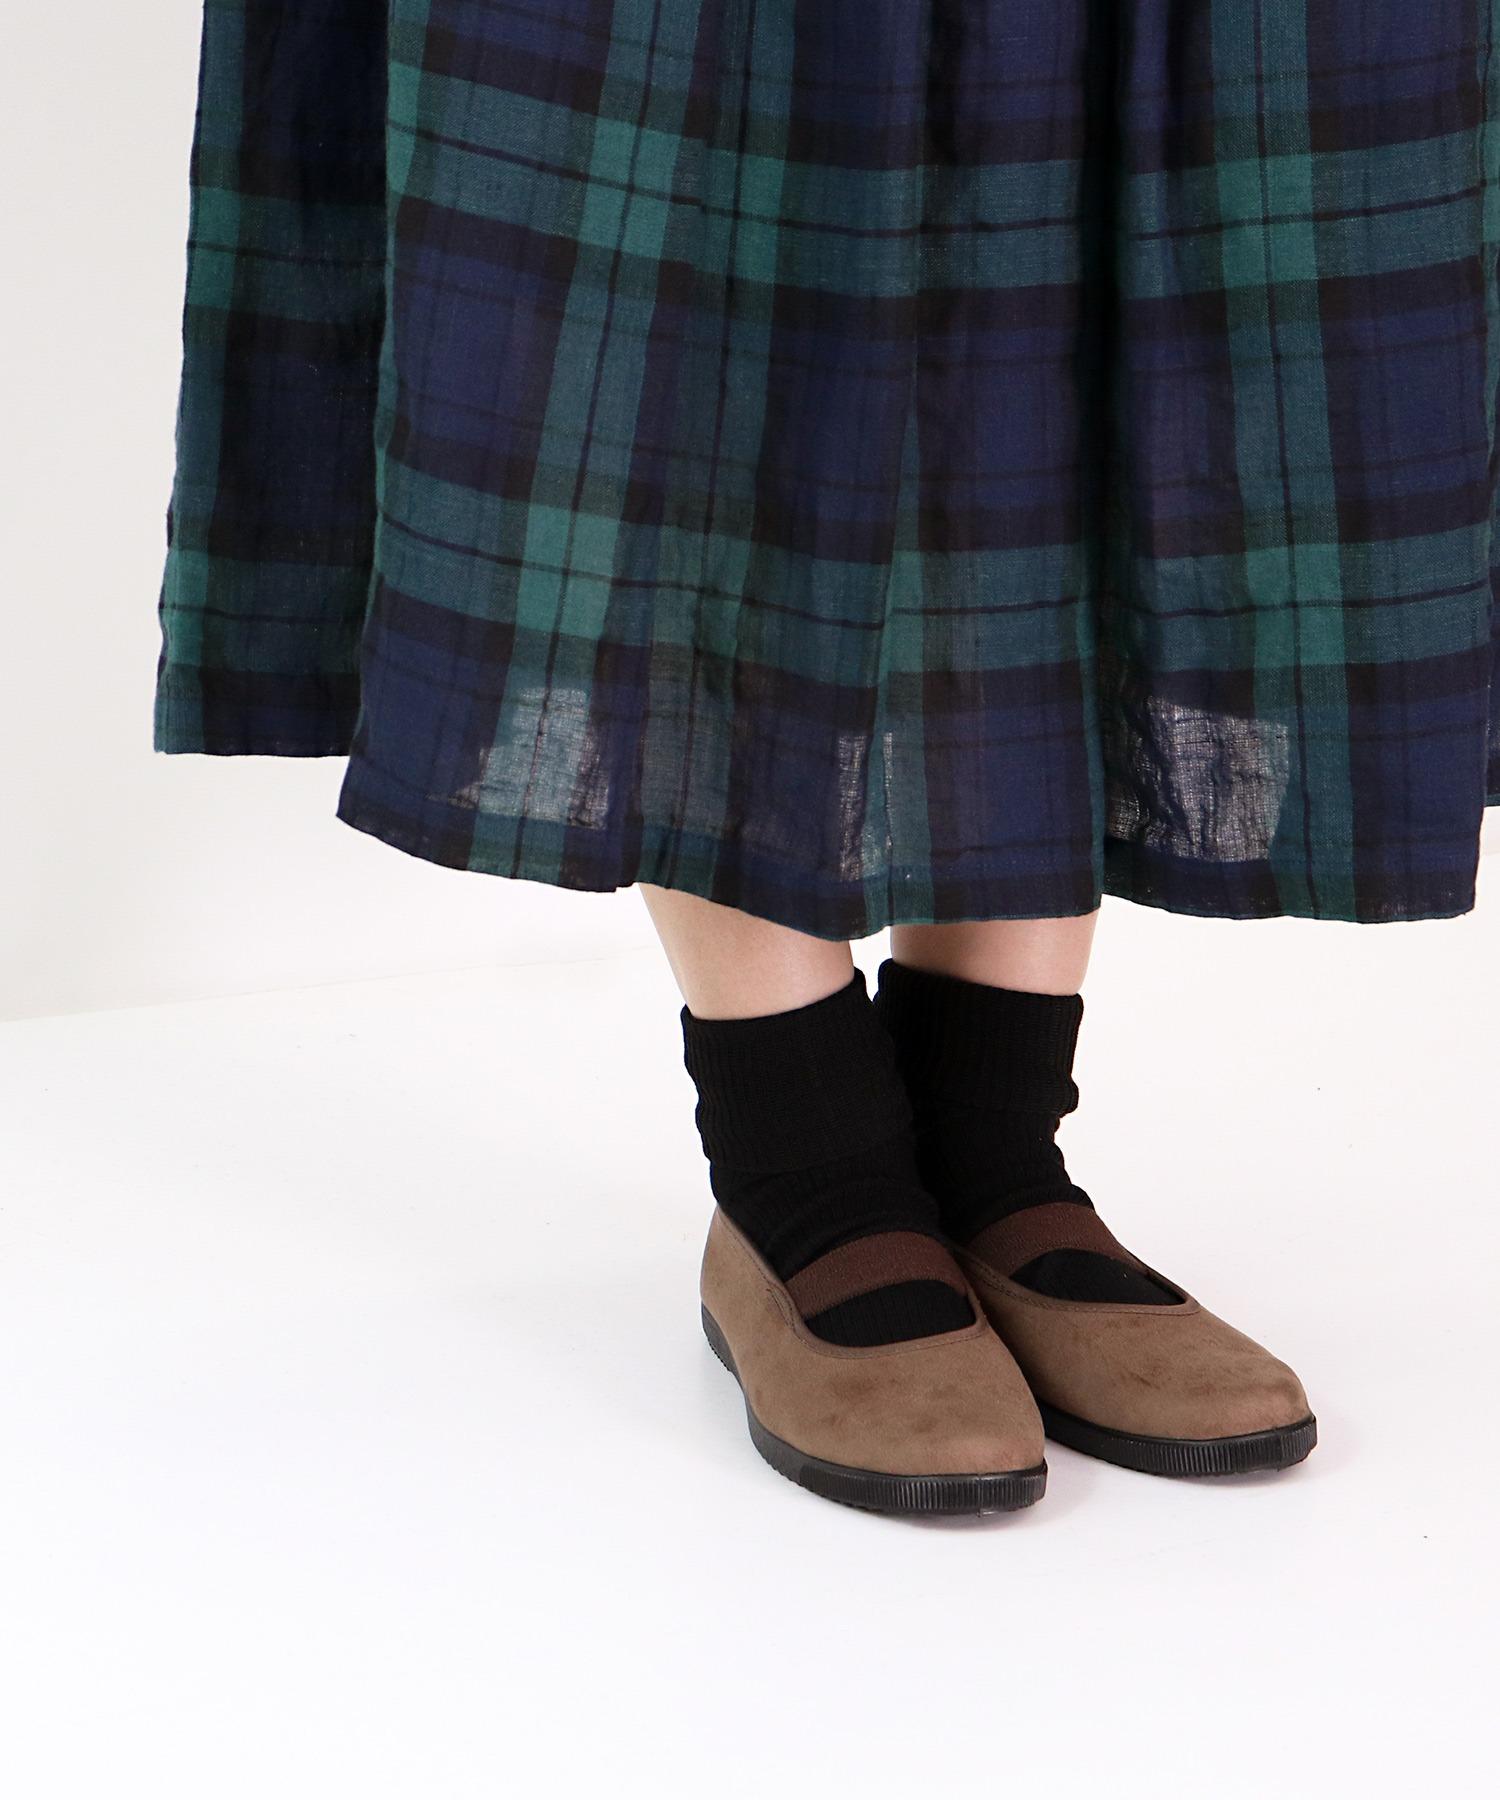 【MOONSTAR / ムーンスター】BALLET SHOES バレエスリッポン/上履きスニーカー